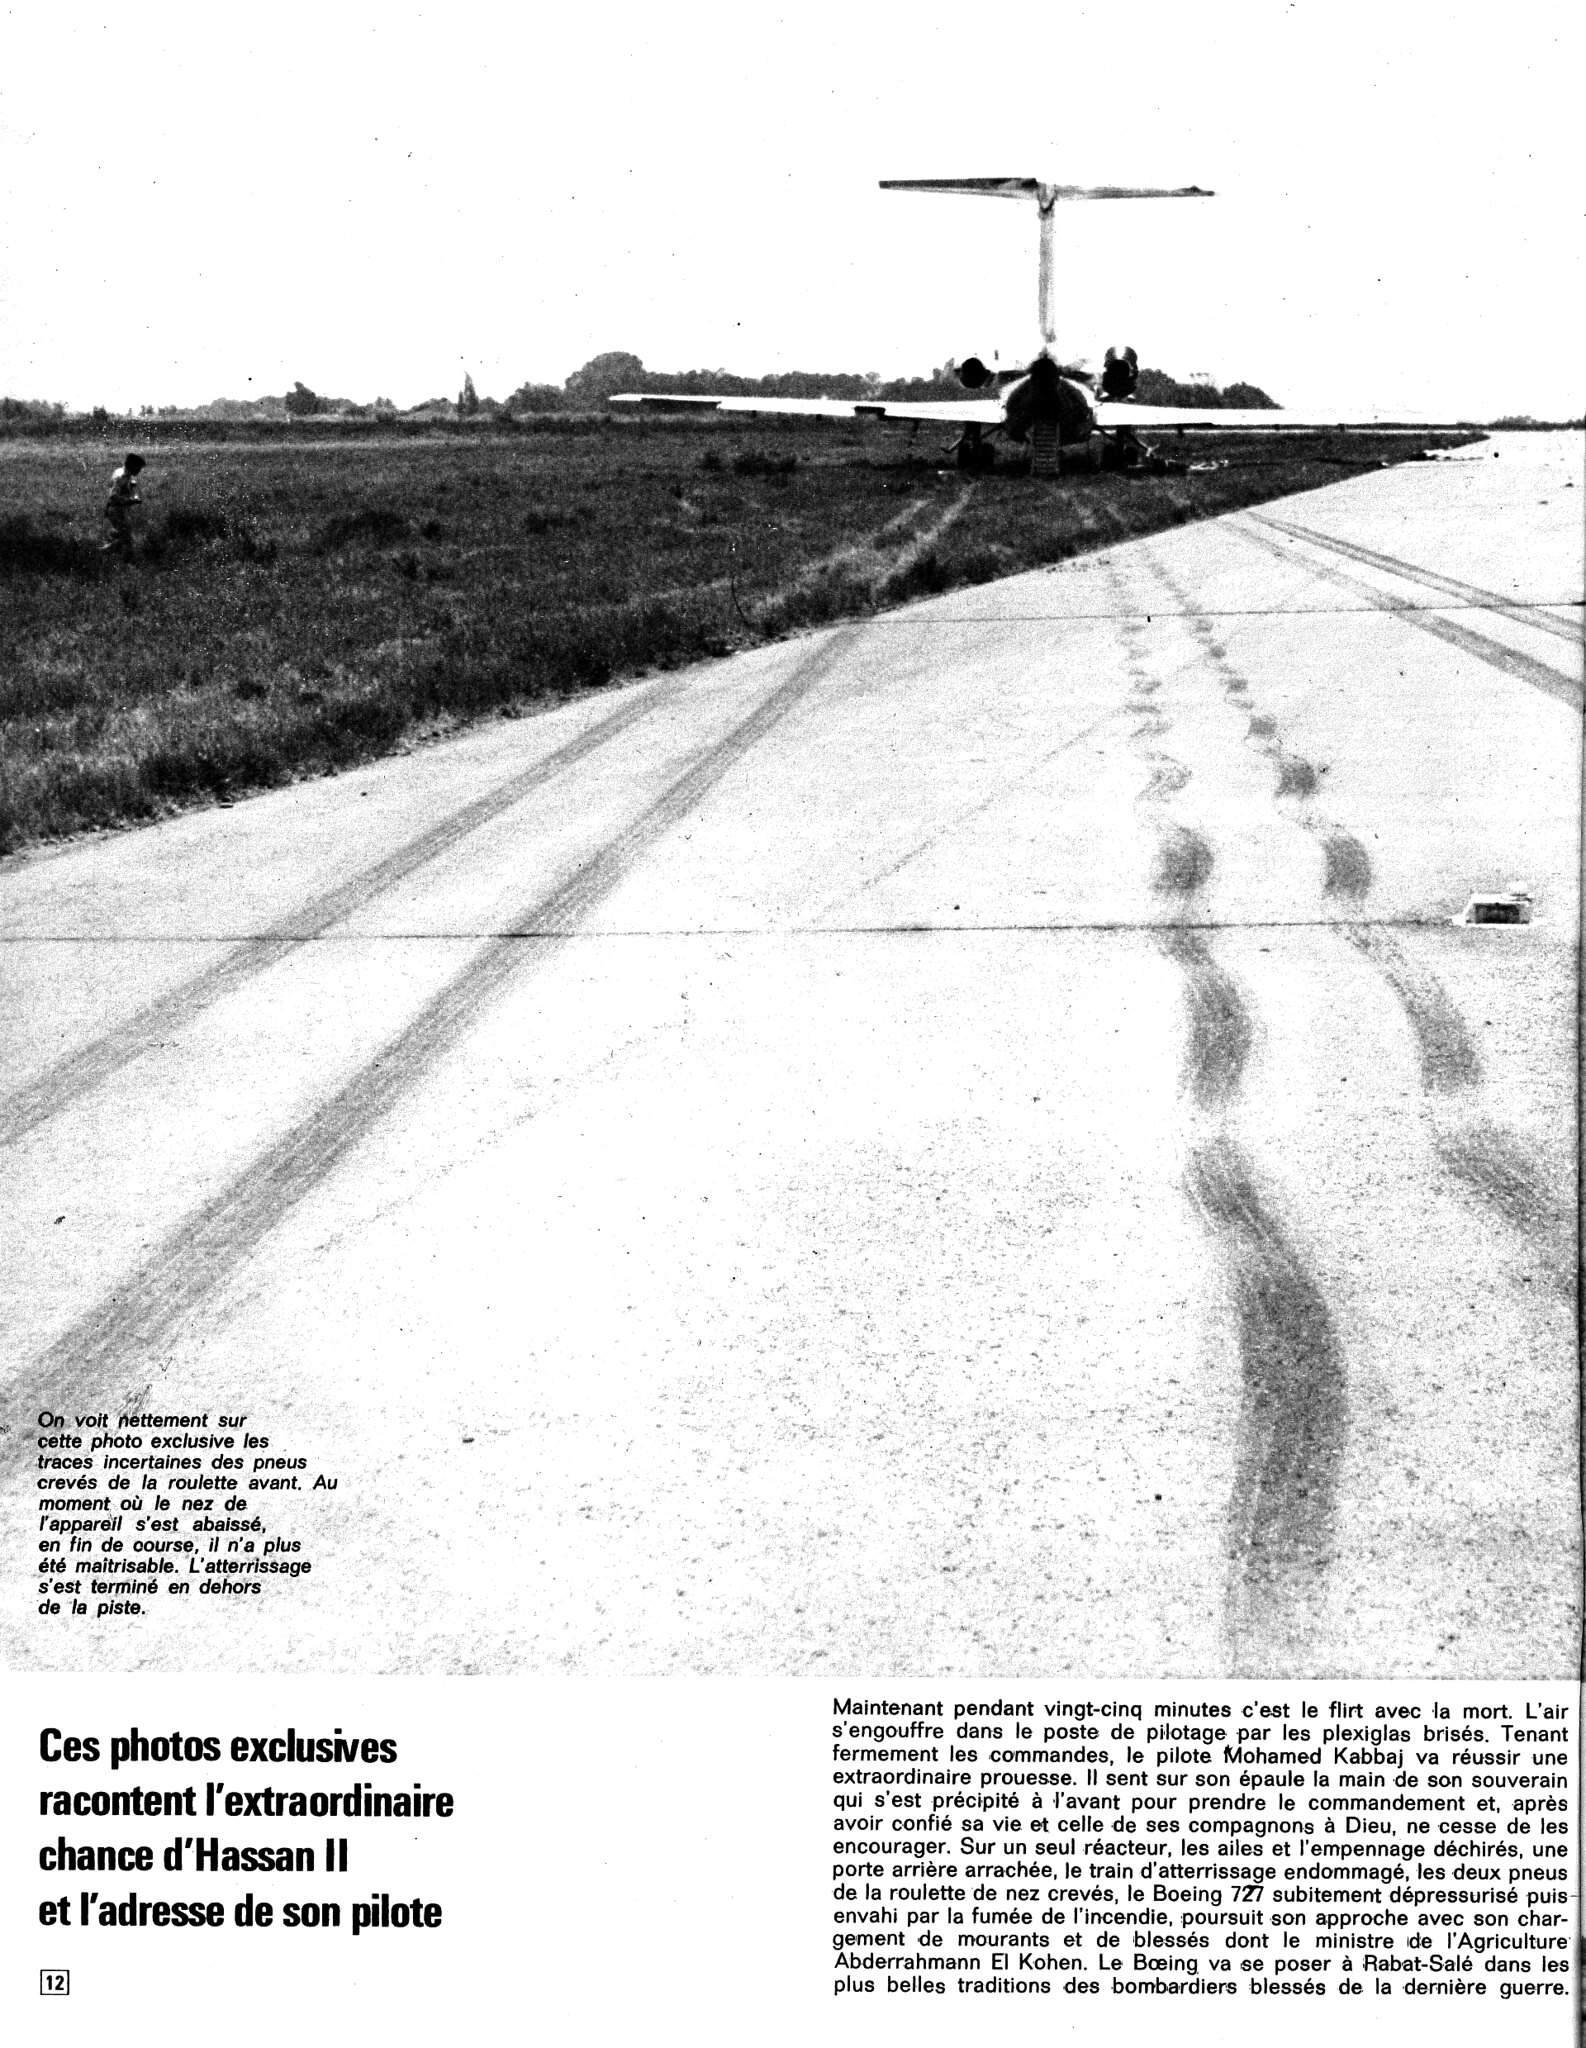 Tentative de coup d'État Boeing Royal vs F-5A/B Opération Borak le 16 août 1972 49016165617_0e9e74aafc_k